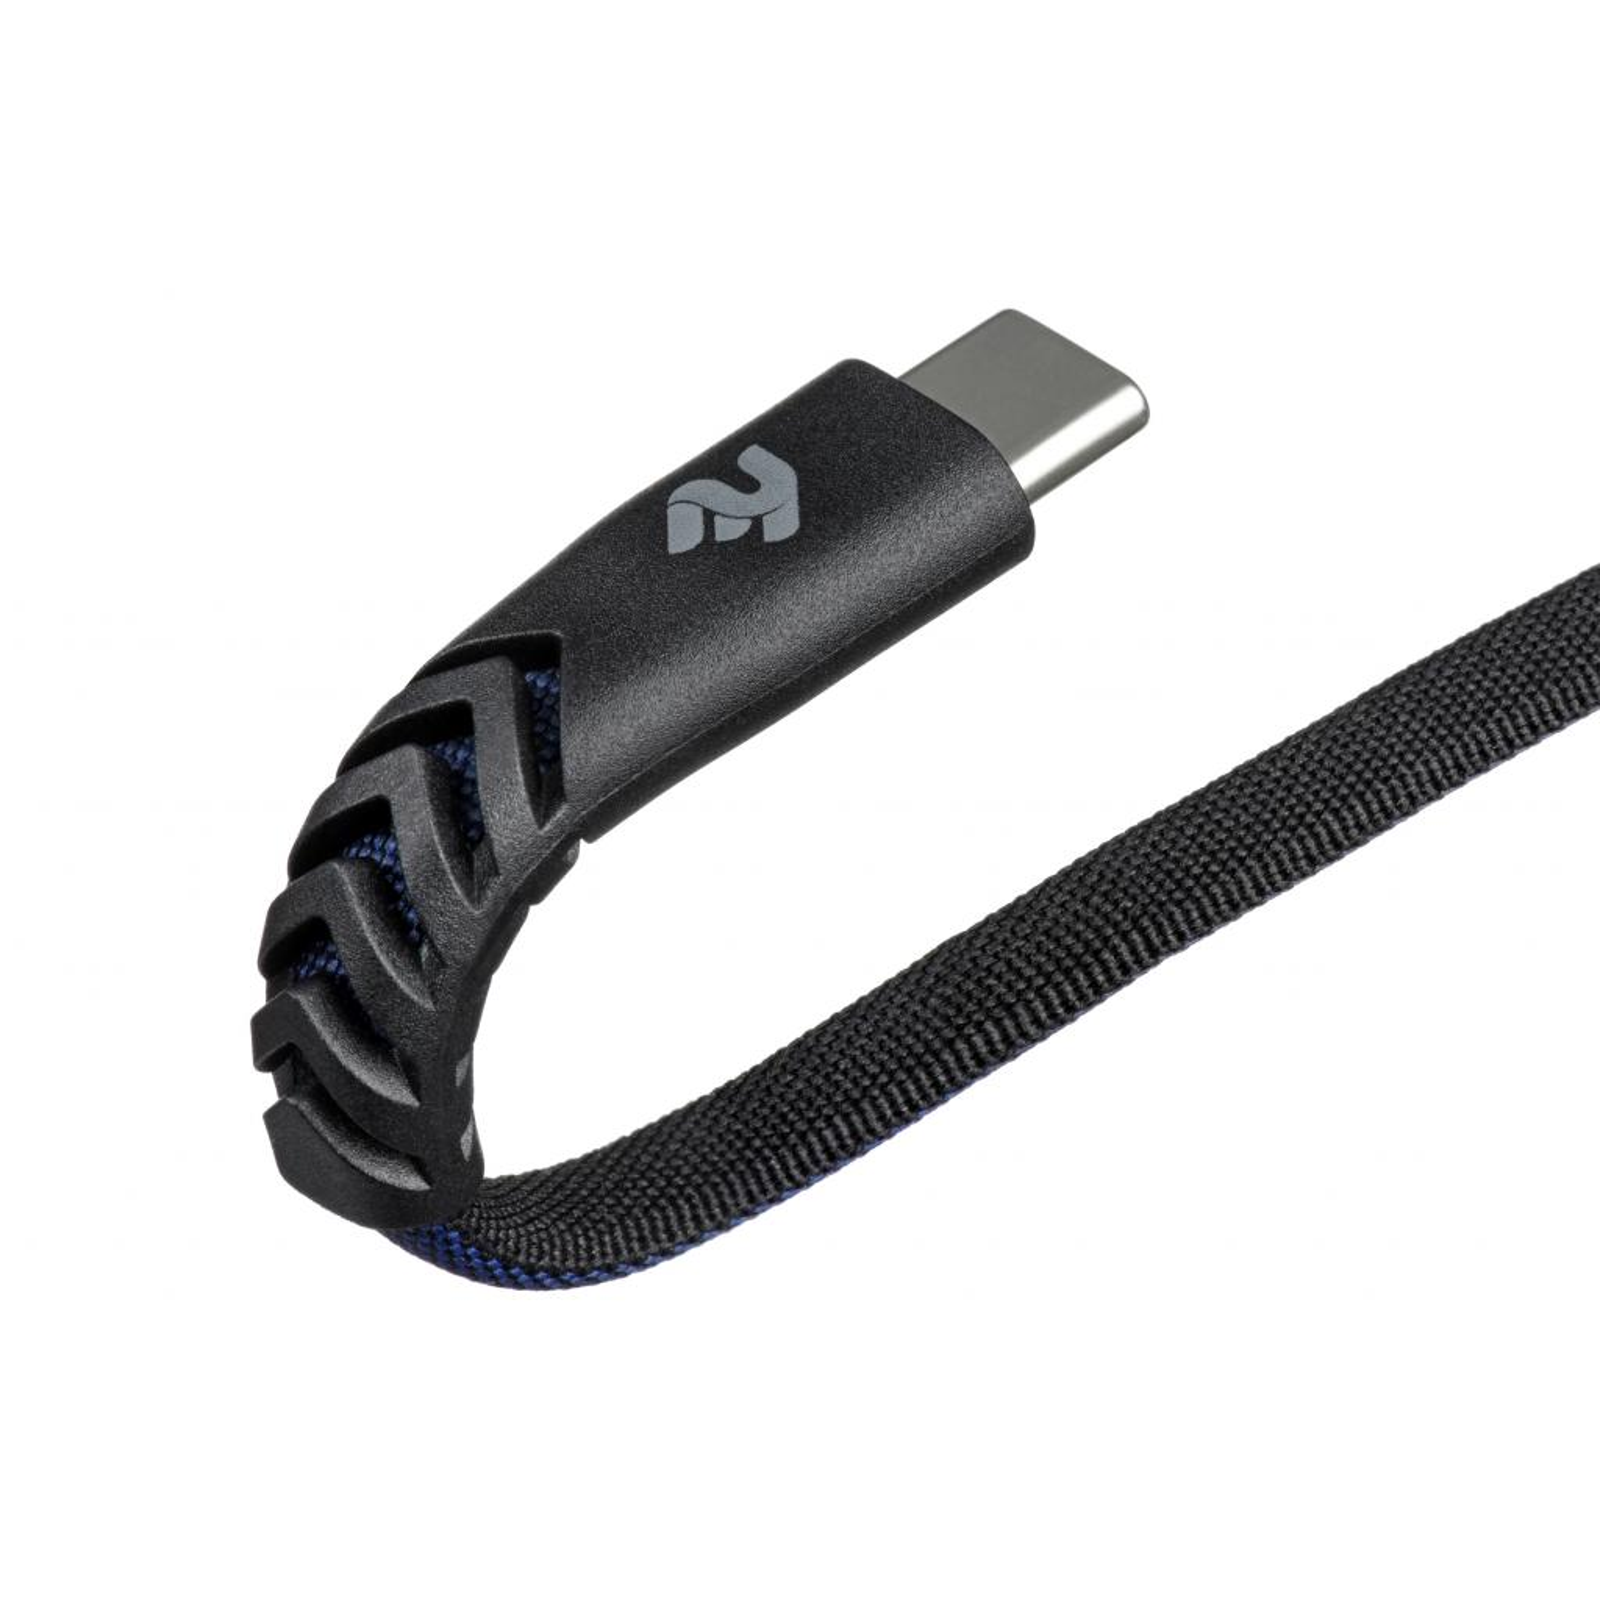 Дата кабель USB 2.0 AM to Type-C 1.0m Flat fabric urban, black/blue 2E (2E-CCTT-1MBL) изображение 3